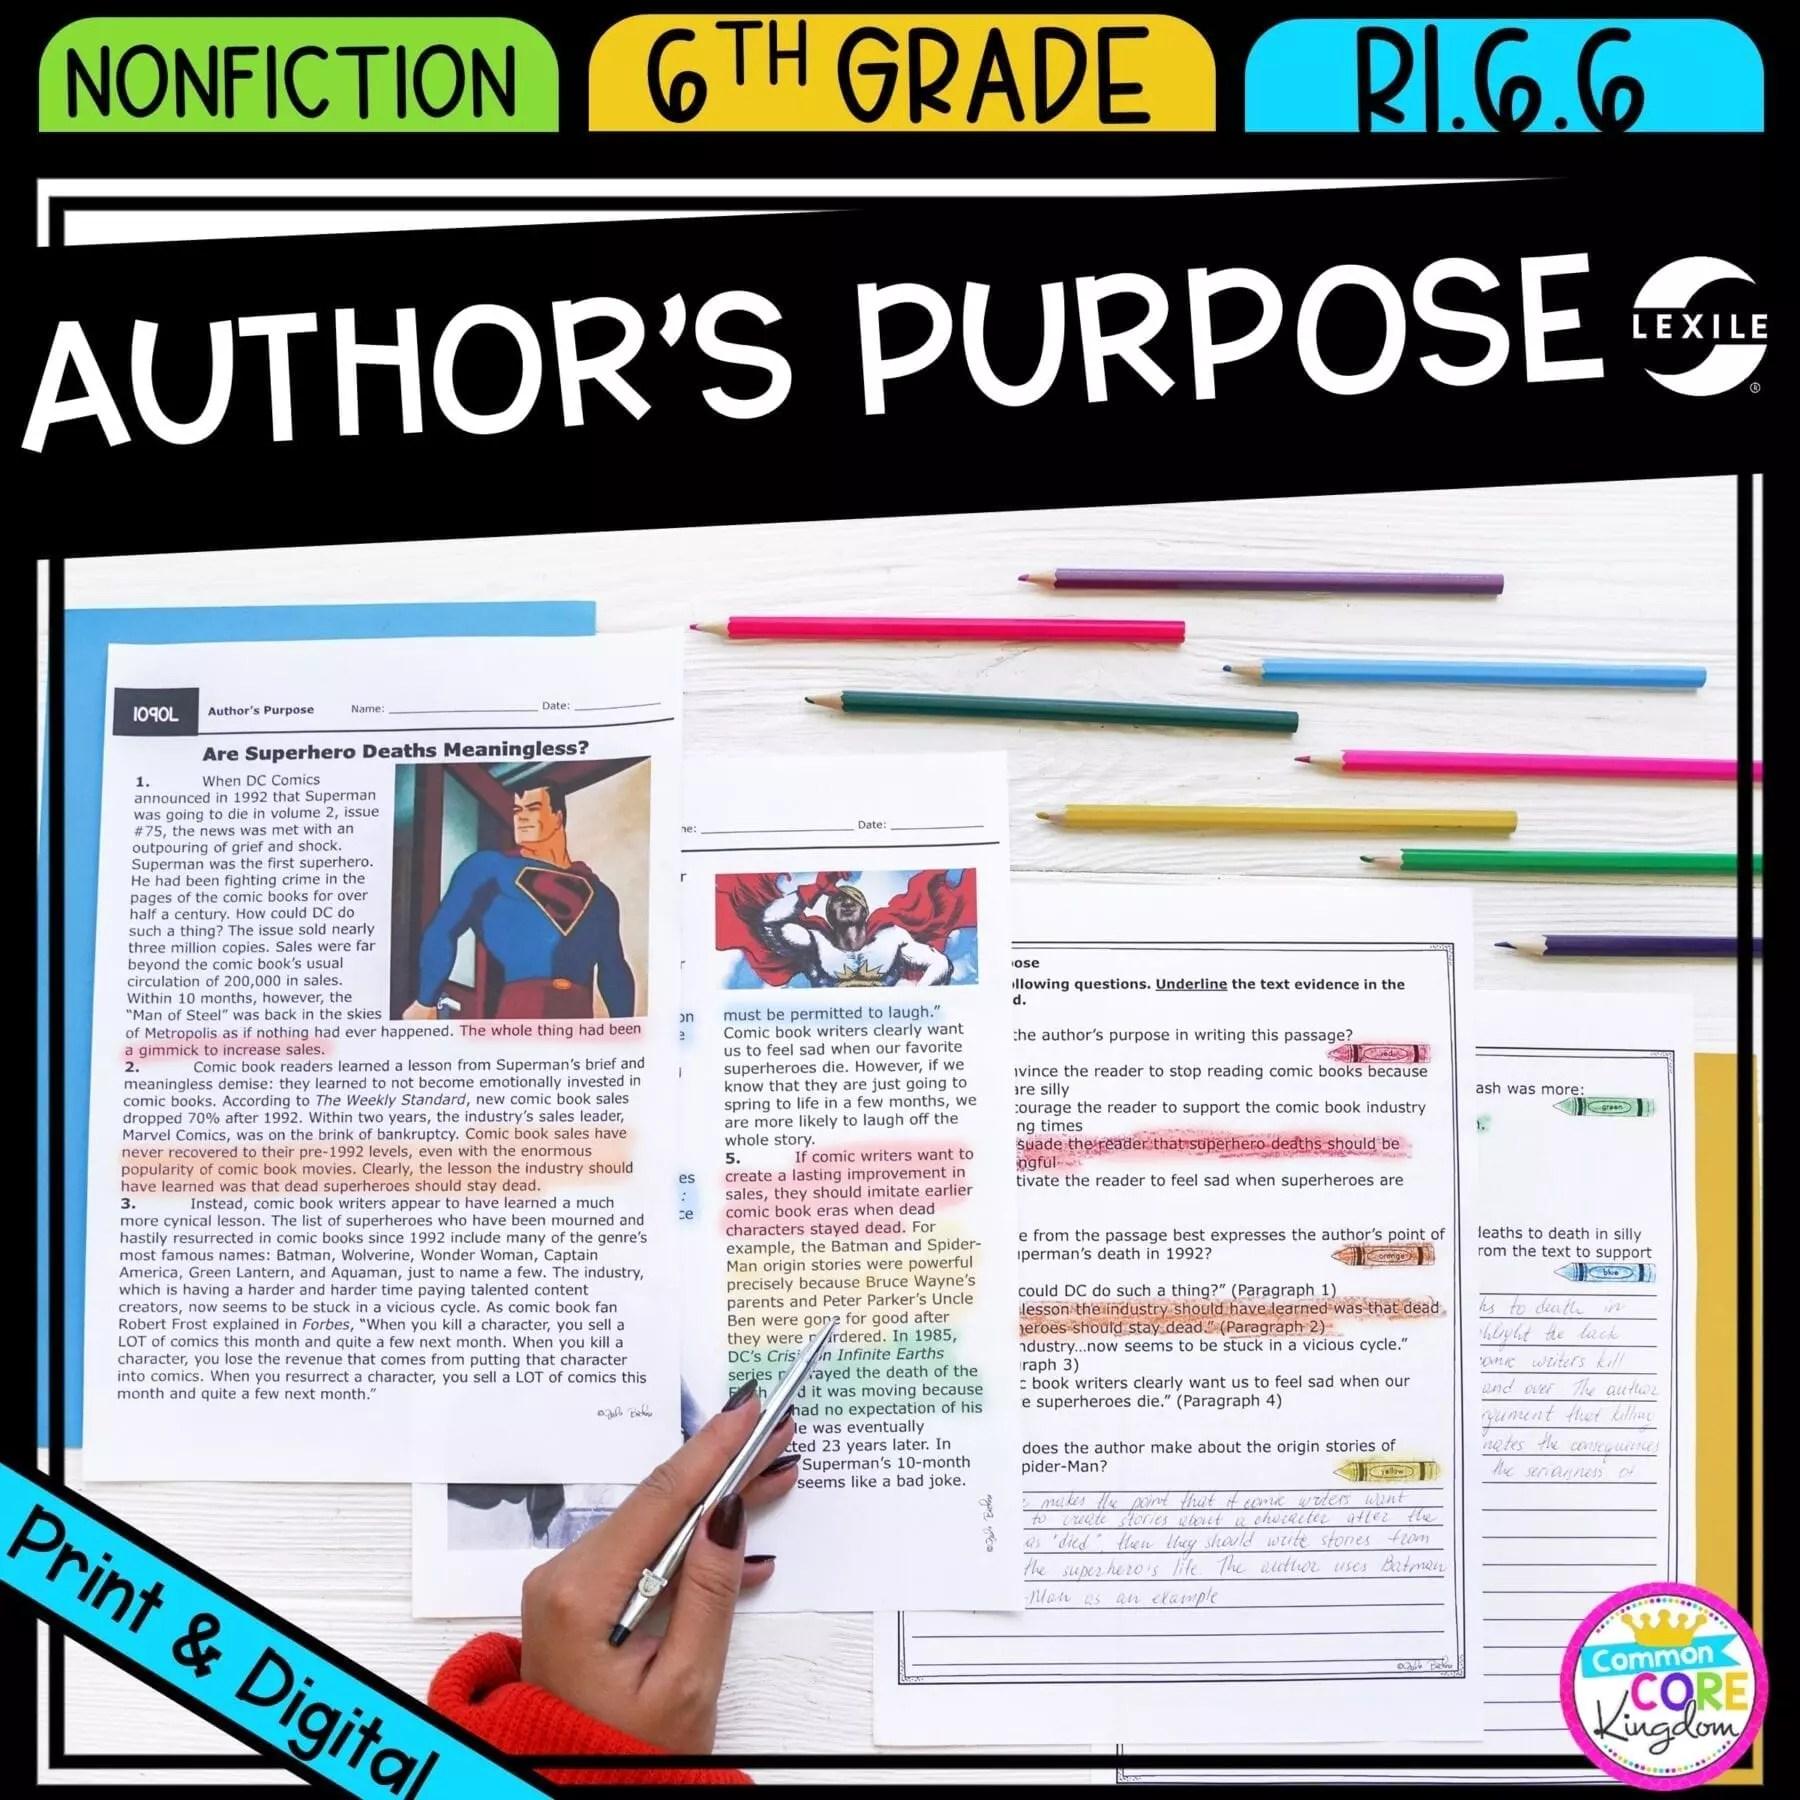 medium resolution of Author's Purpose 6th Grade RI.6.6   Common Core Kingdom